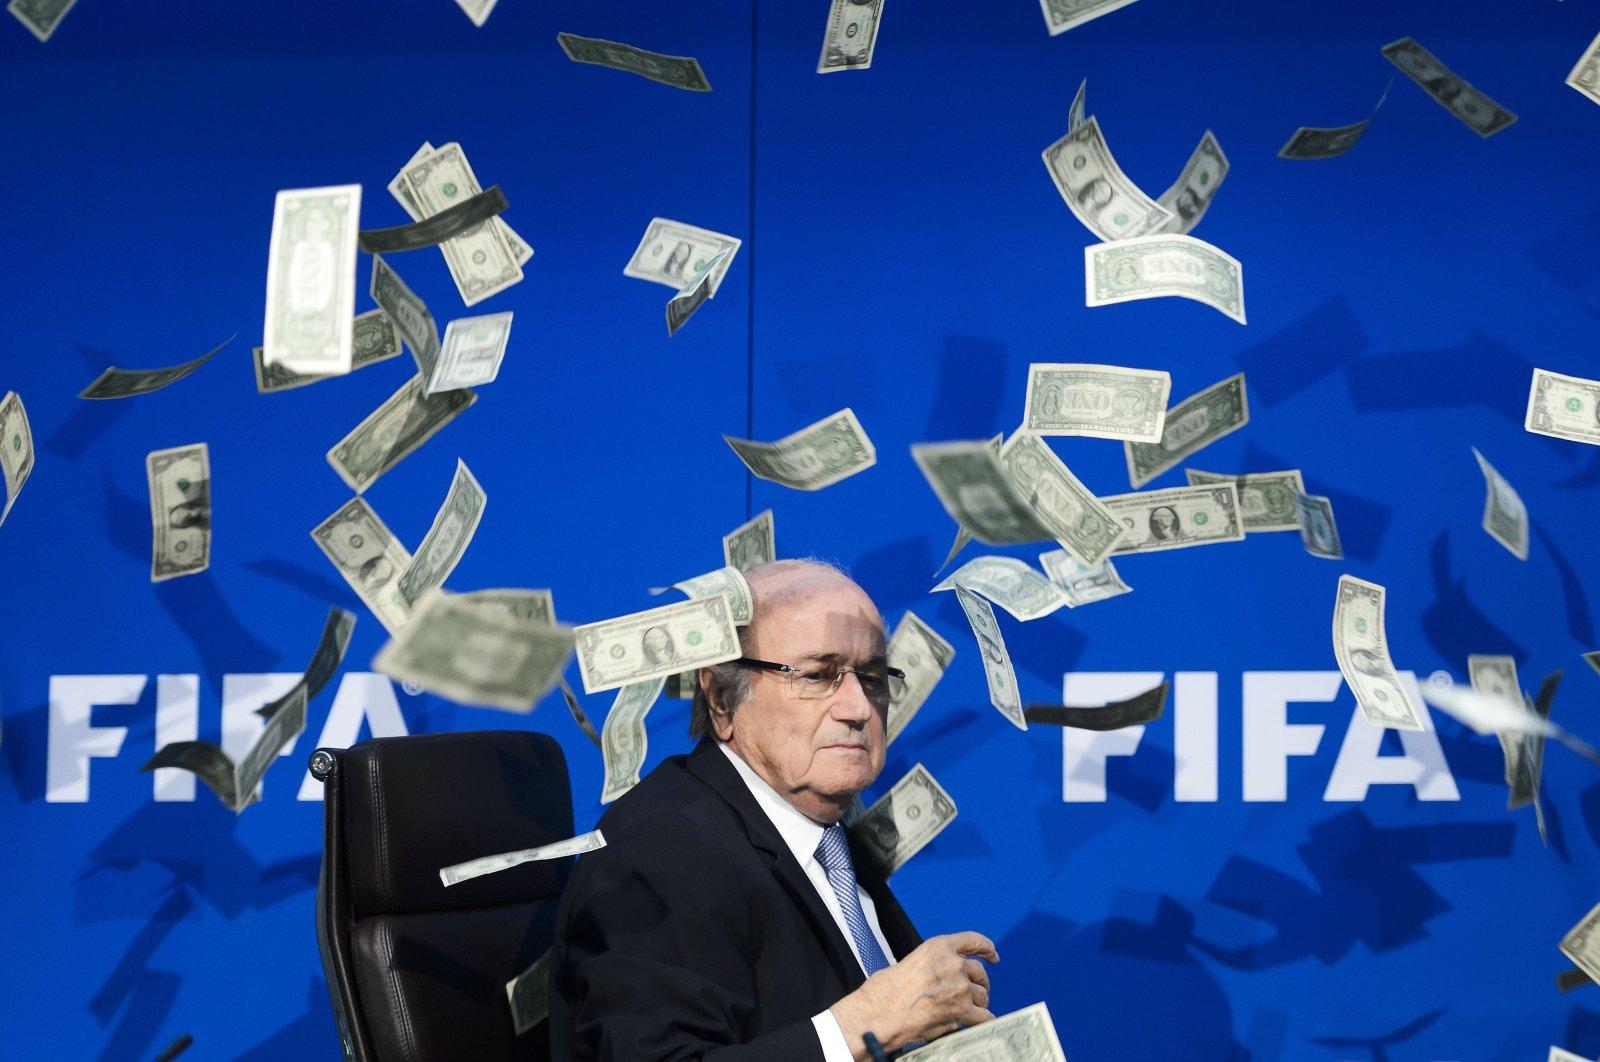 FIFA president Sepp Blatter looks on as fake dollar notes fly around him, in Zurich, Switzerland, Jul. 20, 2015.  (AFP PHOTO)